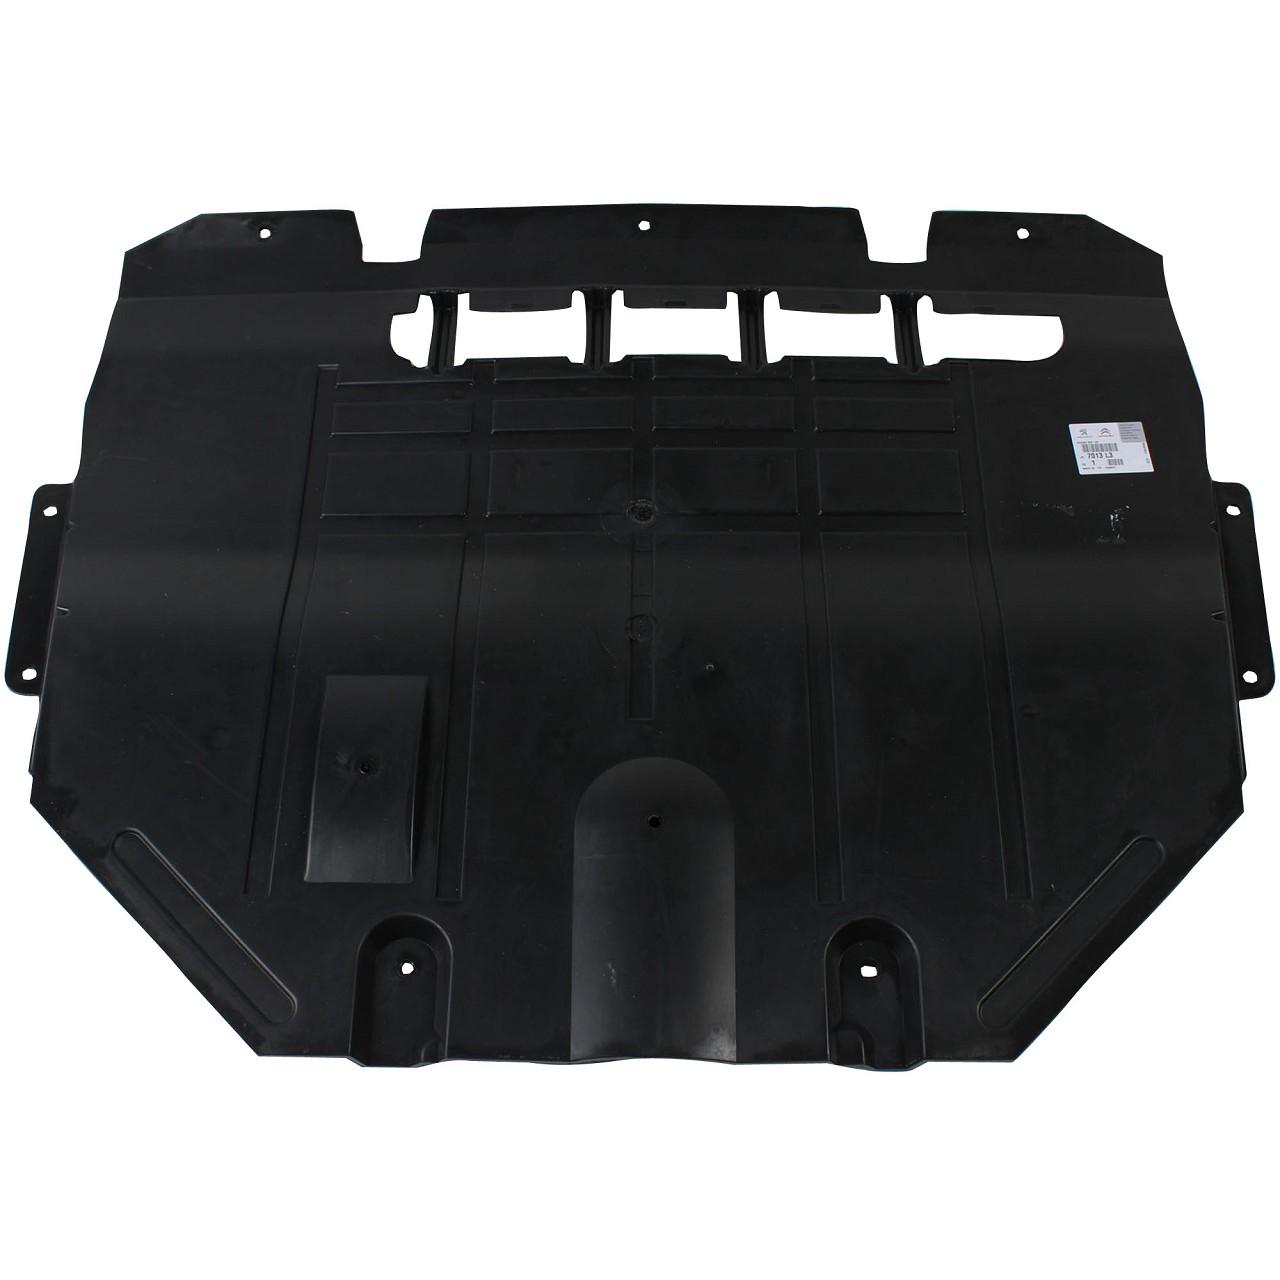 ORIGINAL Peugeot Unterfahrschutz Unterbodenschutz 307 / Break / SW CC 7013.L3